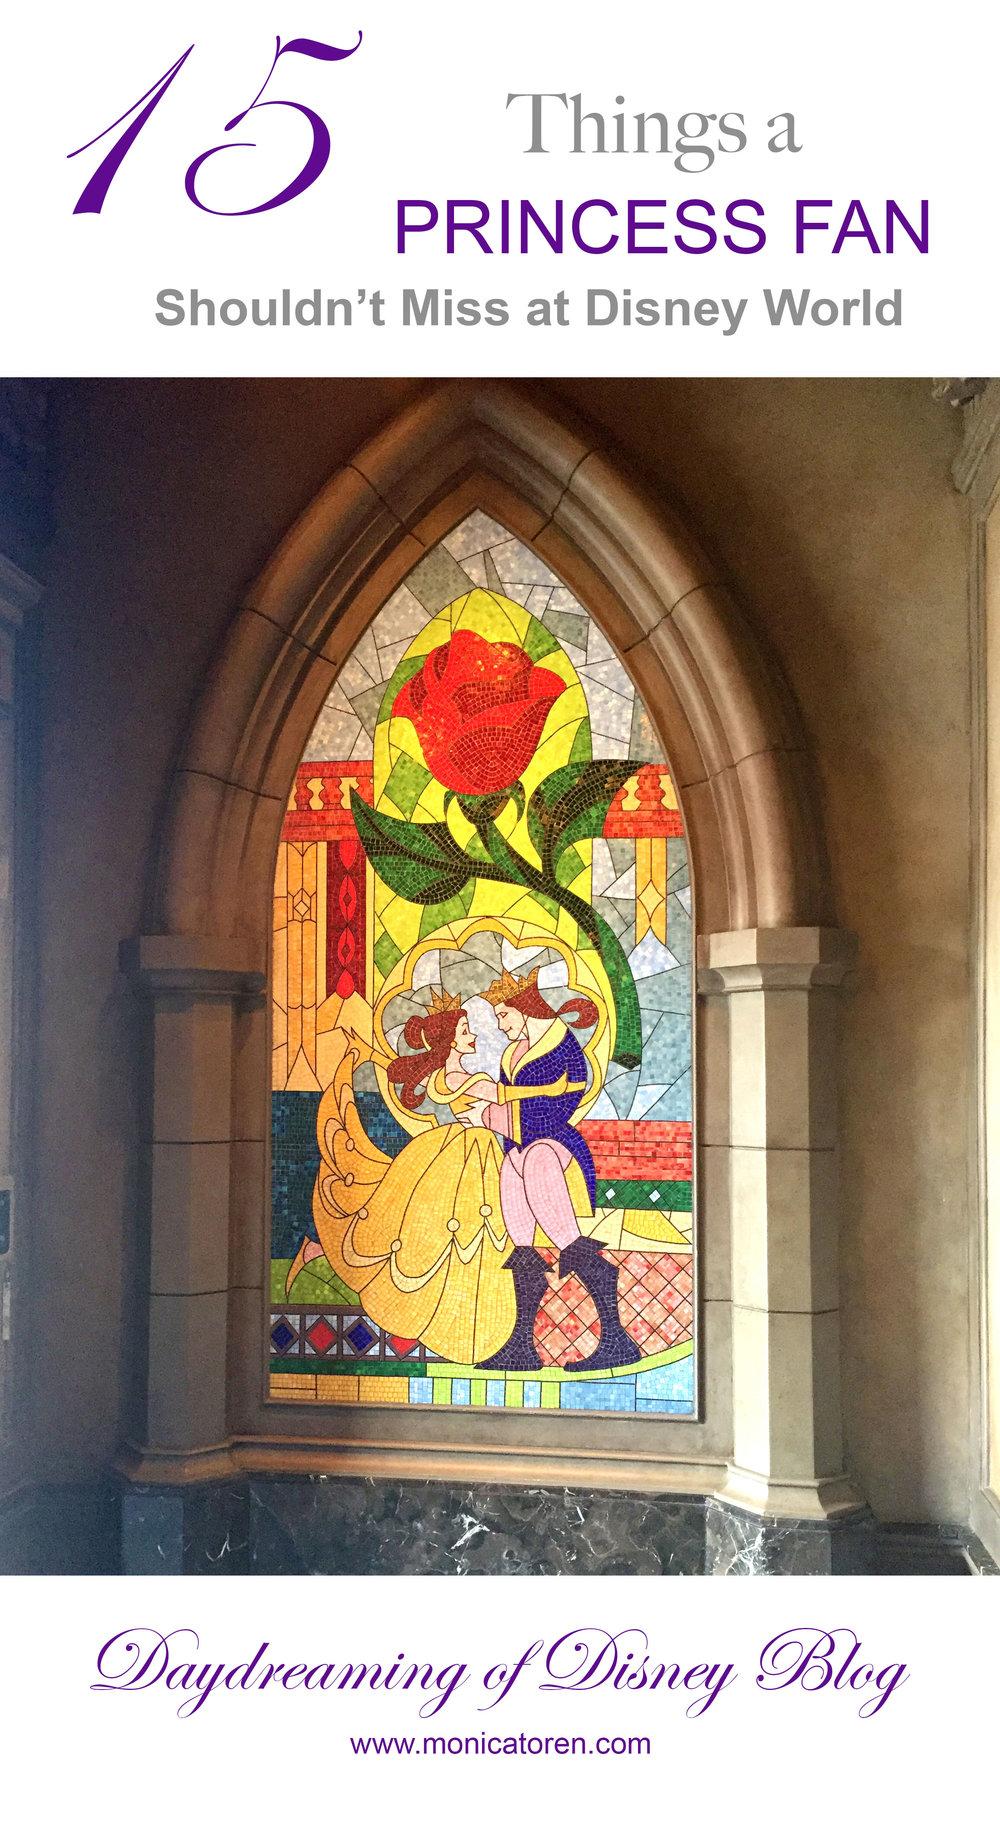 Daydreaming of Disney Blog - 15 Things a Princess Fan Shouldn't Miss at Disney World - http://www.monicatoren.com